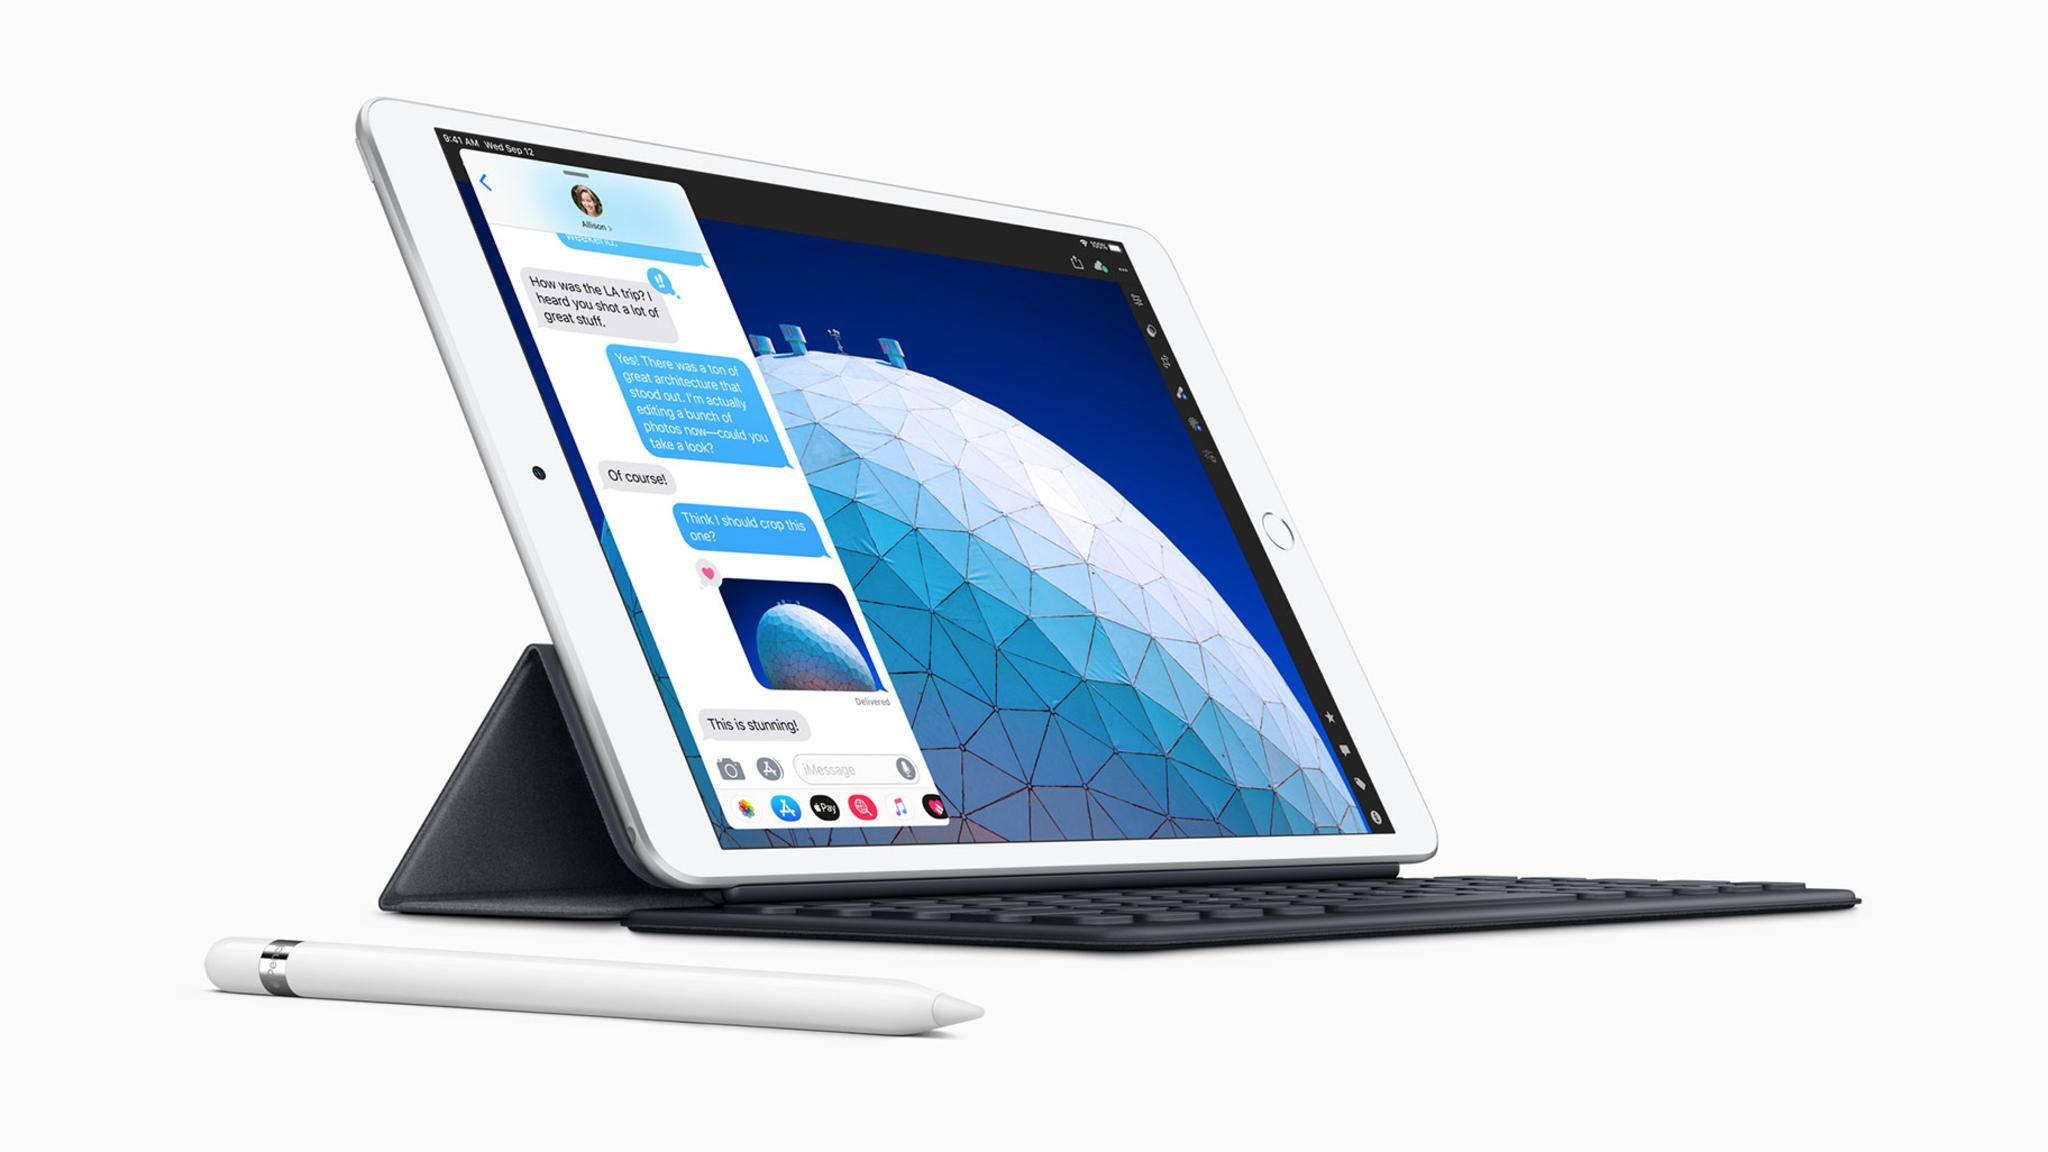 Das nächste iPad Air soll den Fingerabdrucksensor unter dem Display unterbringen.